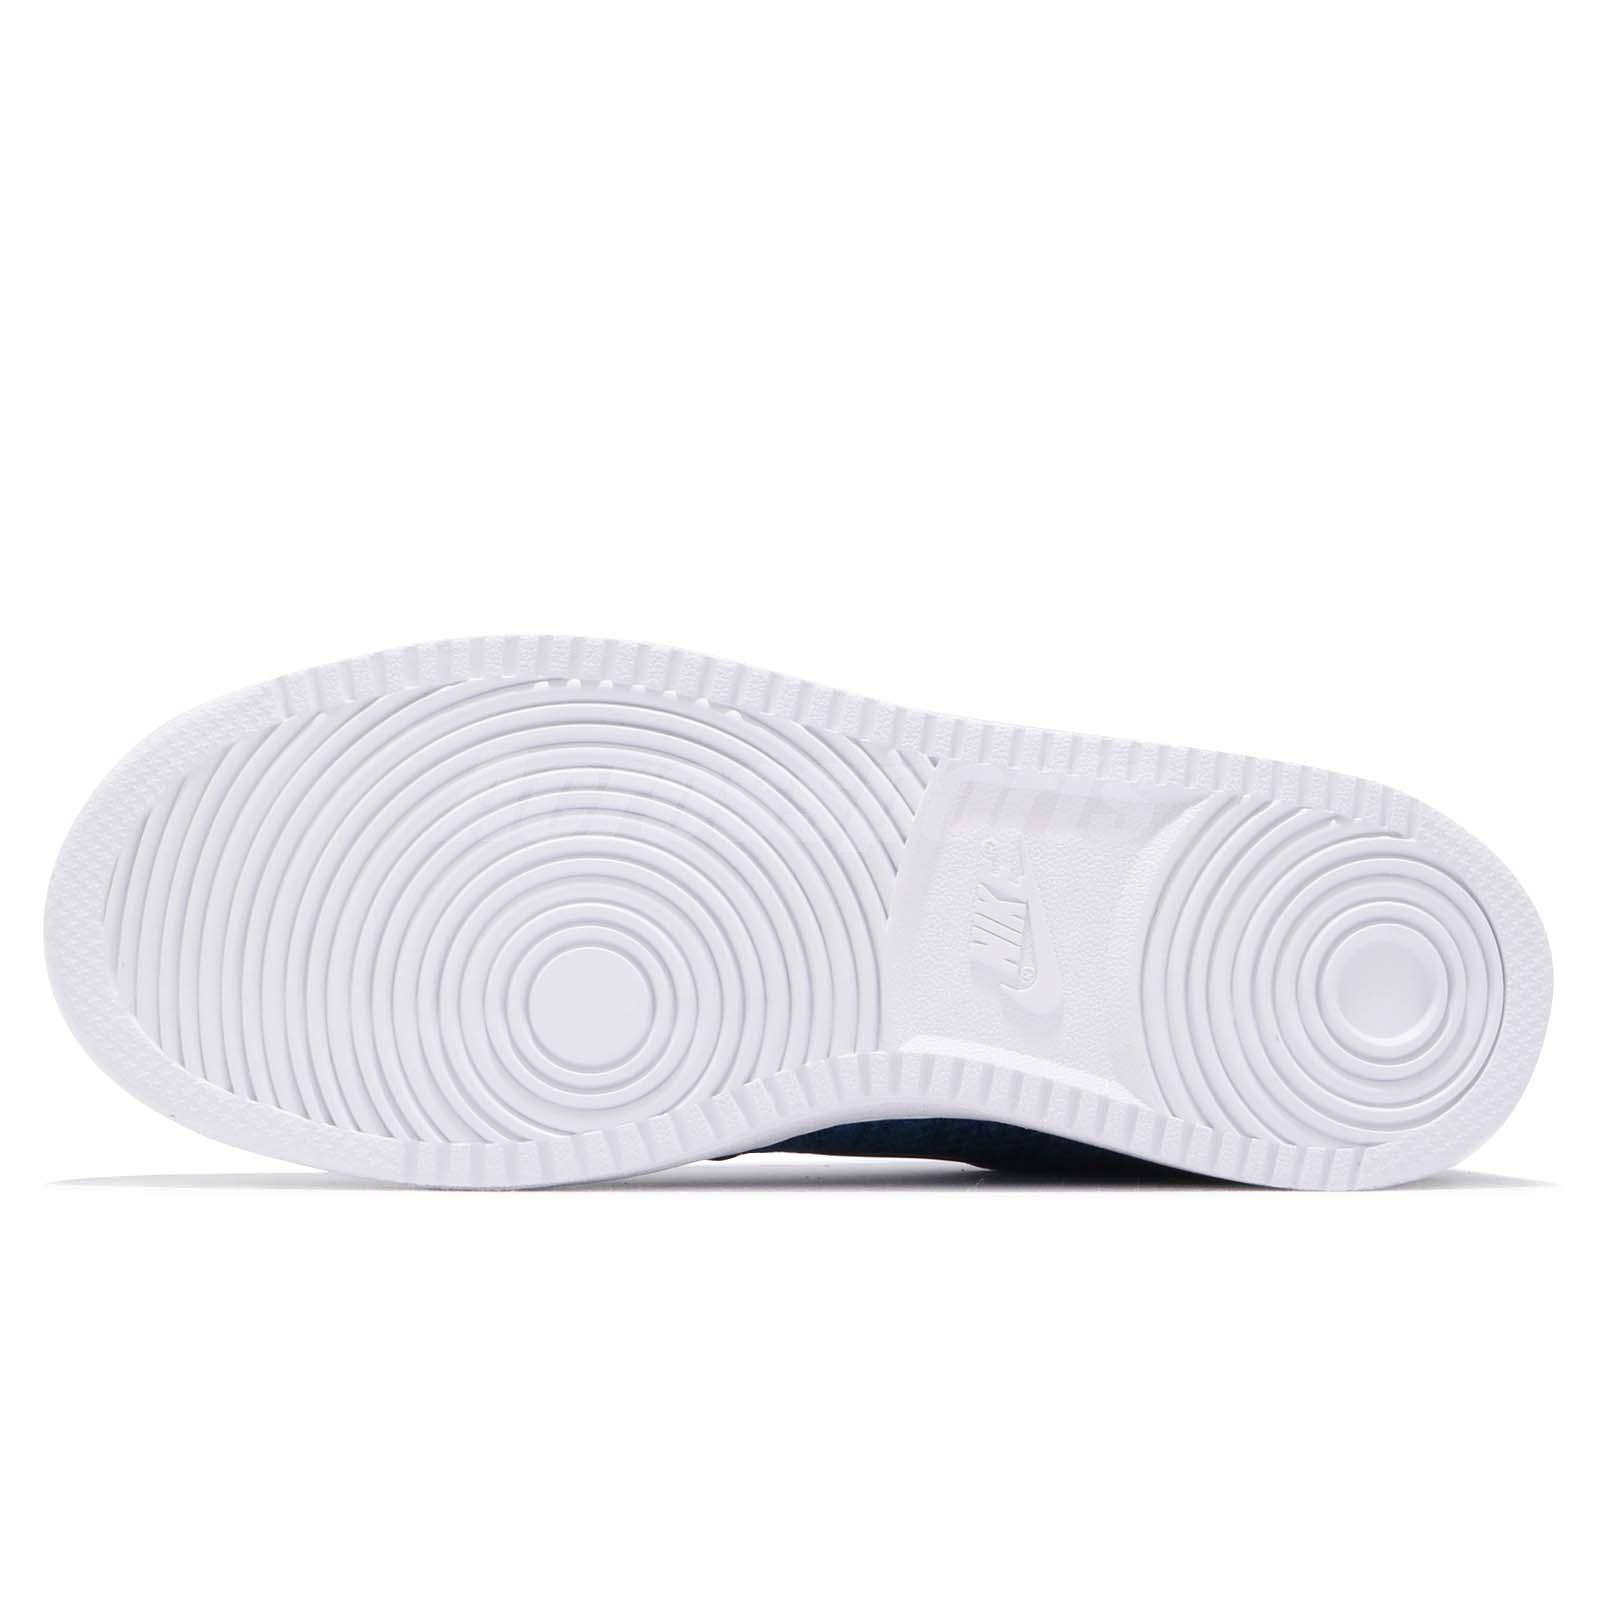 wholesale dealer b0e05 c880f Nike Ebernon Low PREM Premium Blue Navy White Men Casual Shoe ...